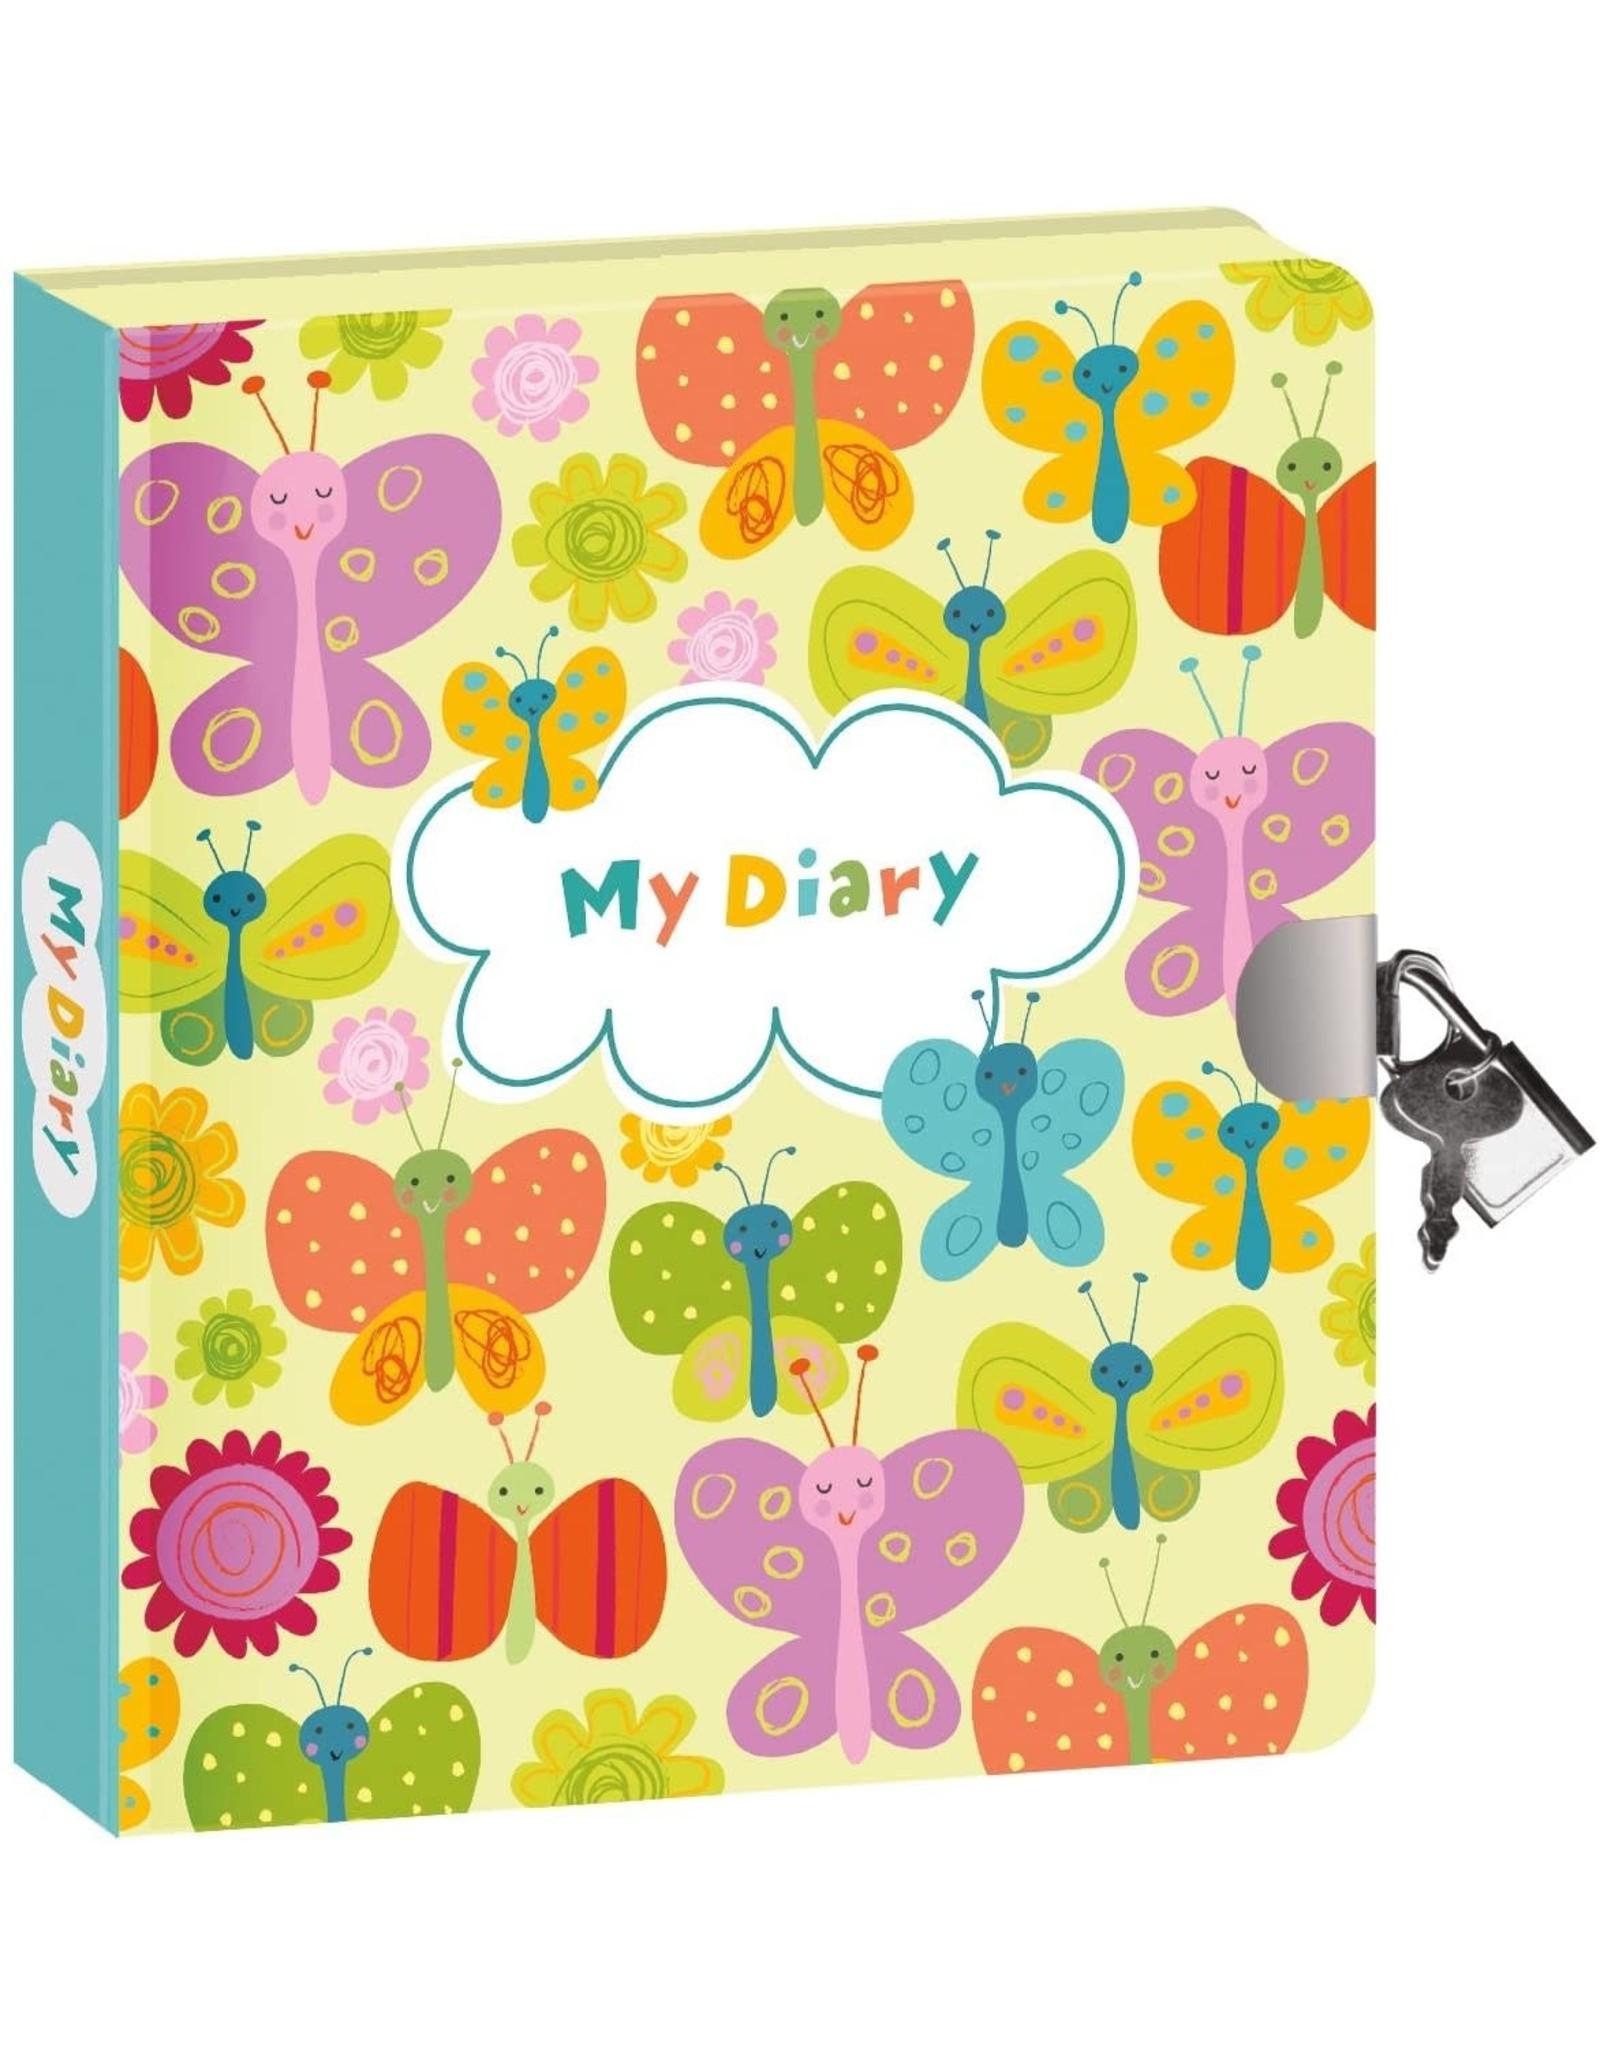 Peaceable Kingdom Butterflies - Glow in the Dark Diary